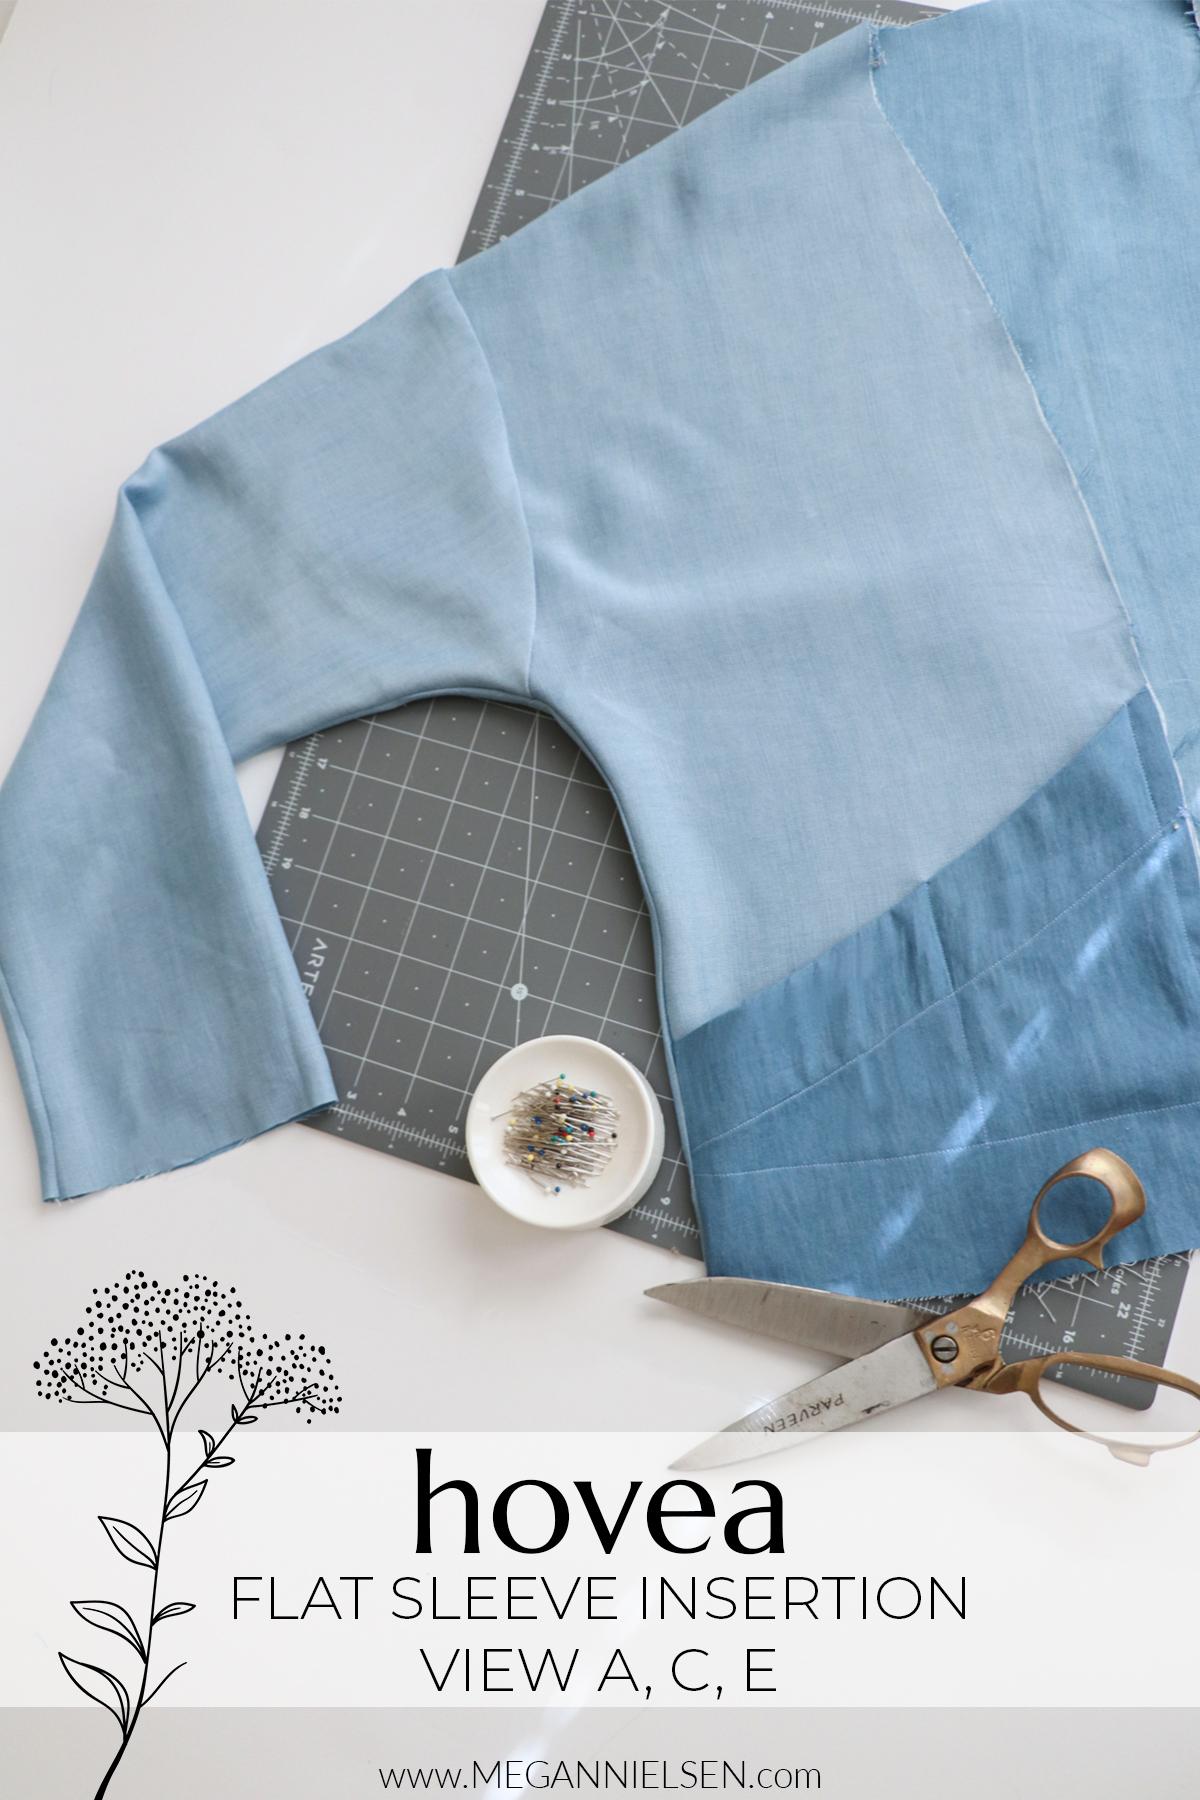 Hovea View A, C & E Flat Sleeve insertion